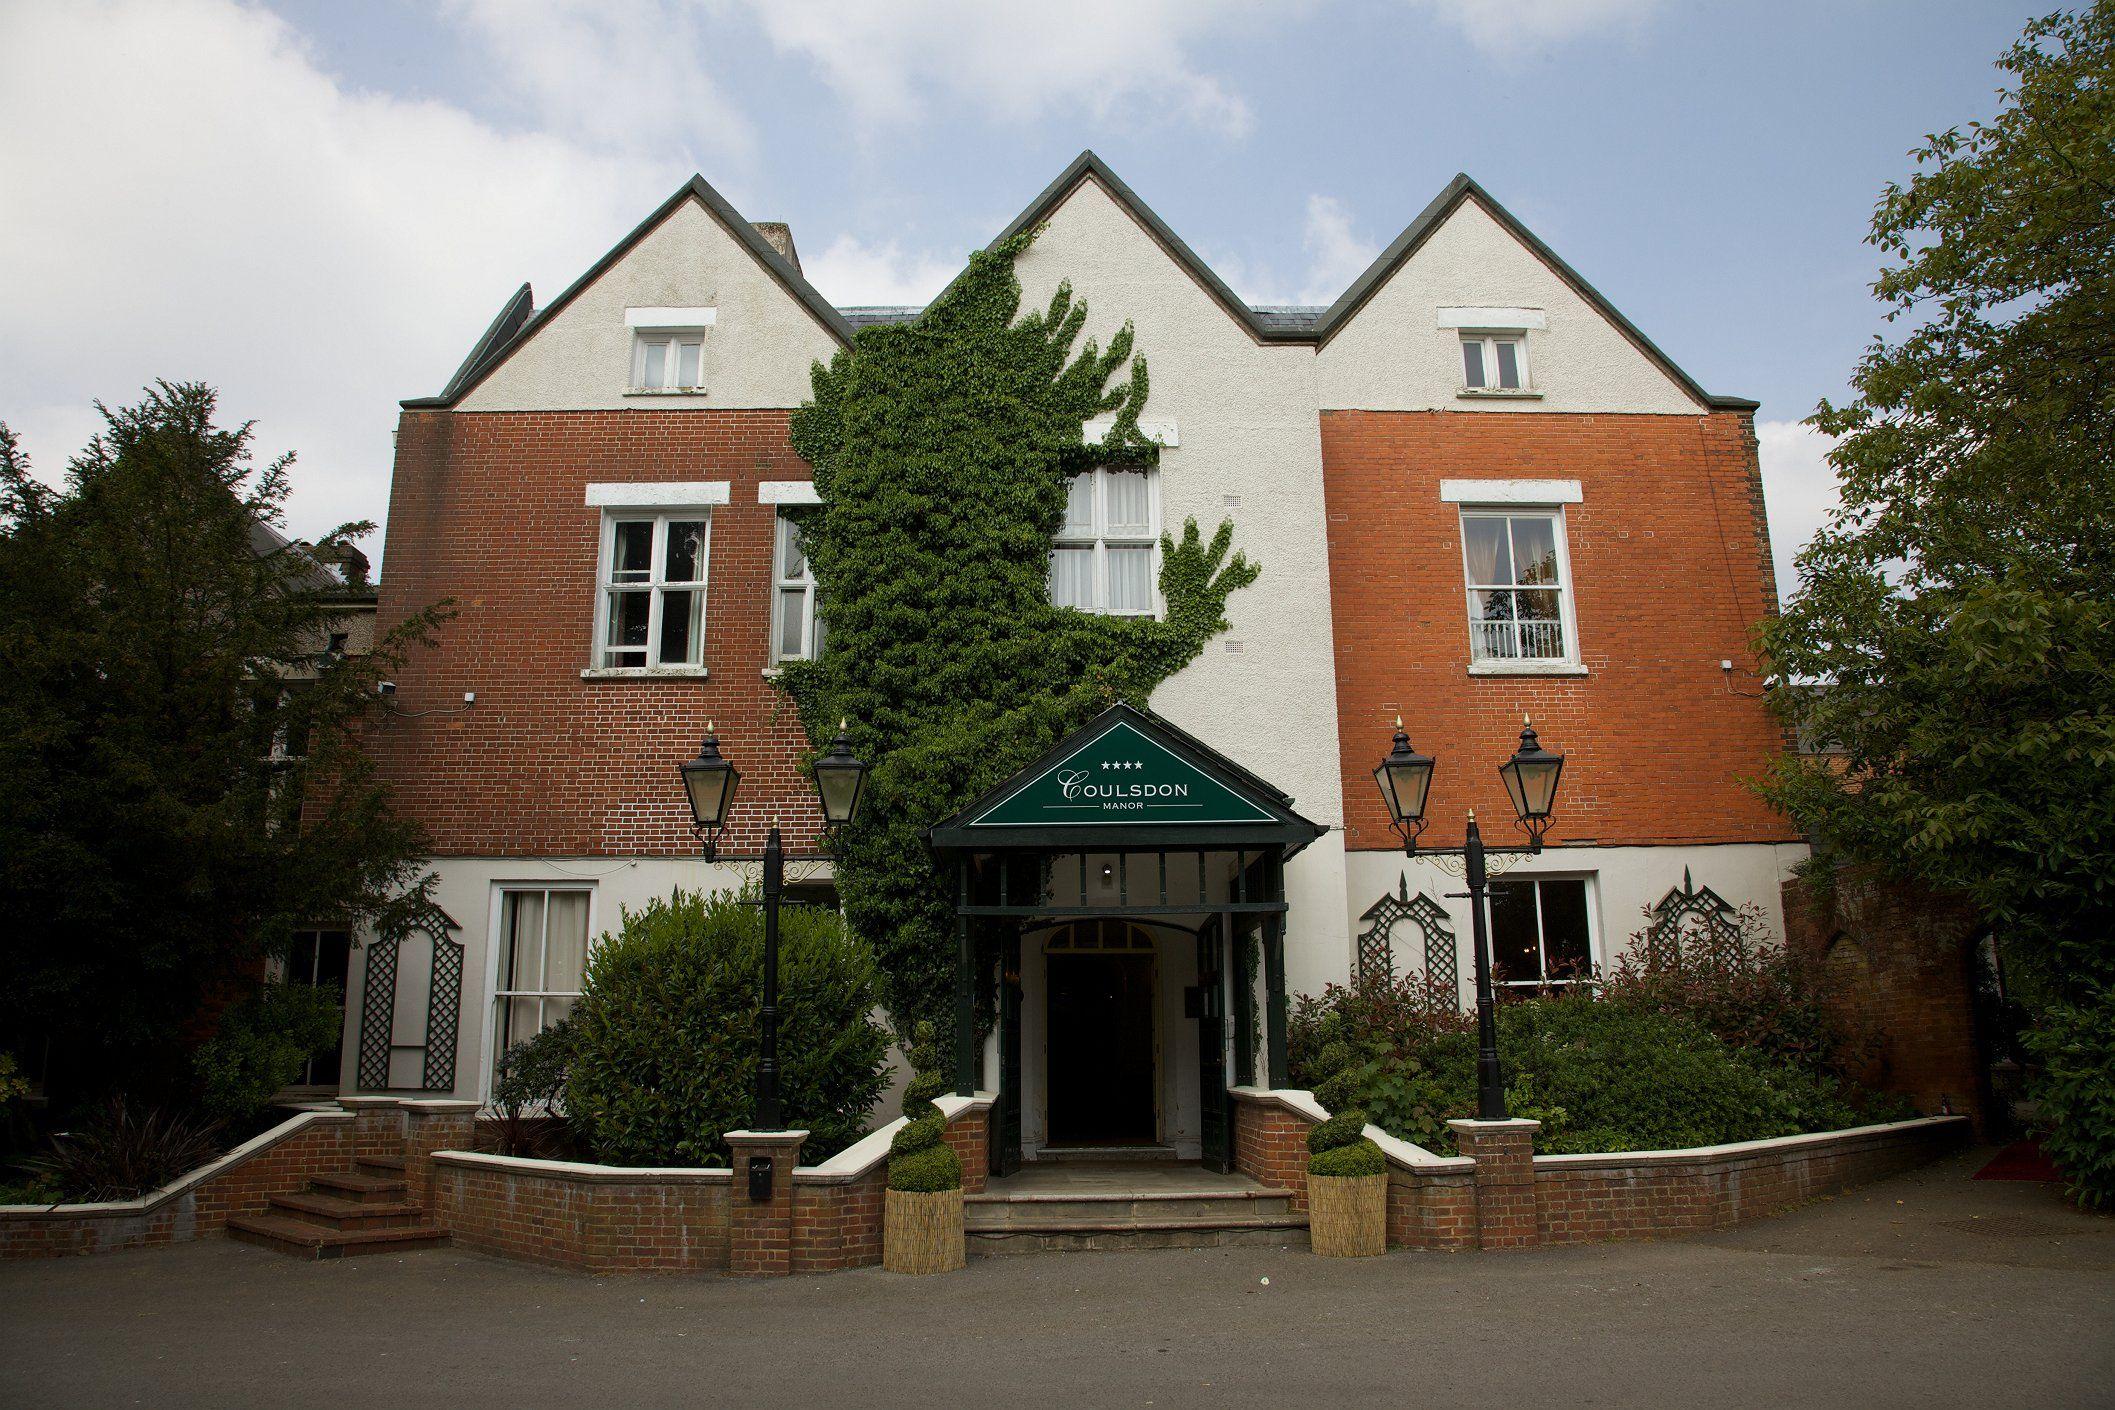 Coulsdon Manor Hotel & Golf Club